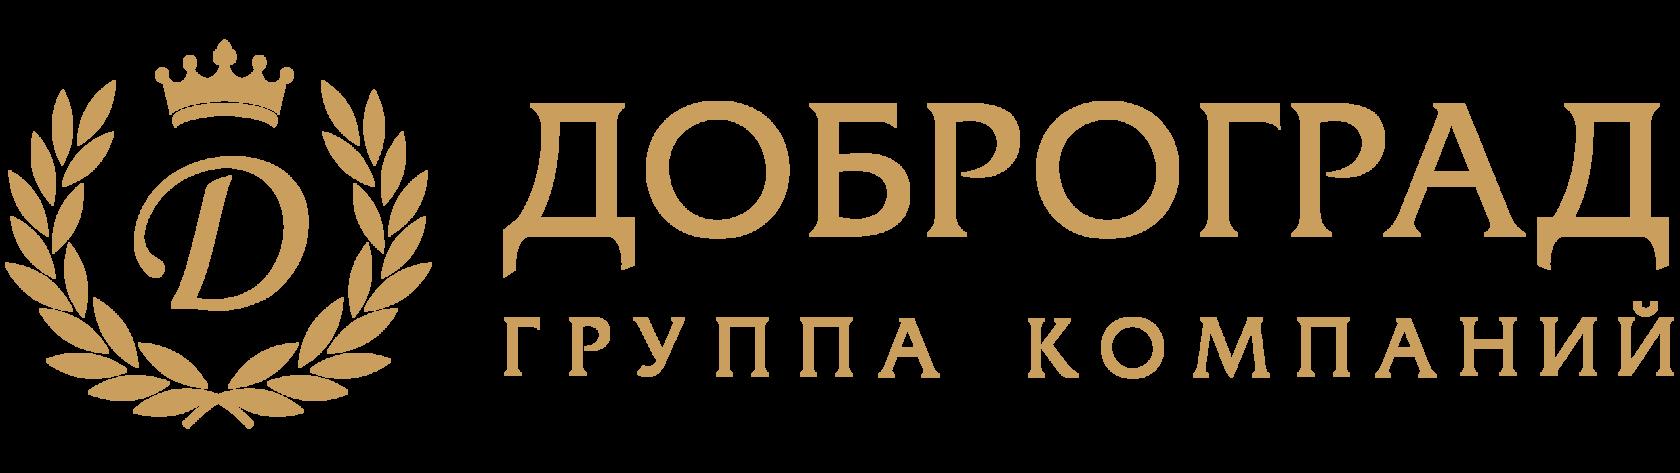 "Застройщика ГК ""Доброград"""